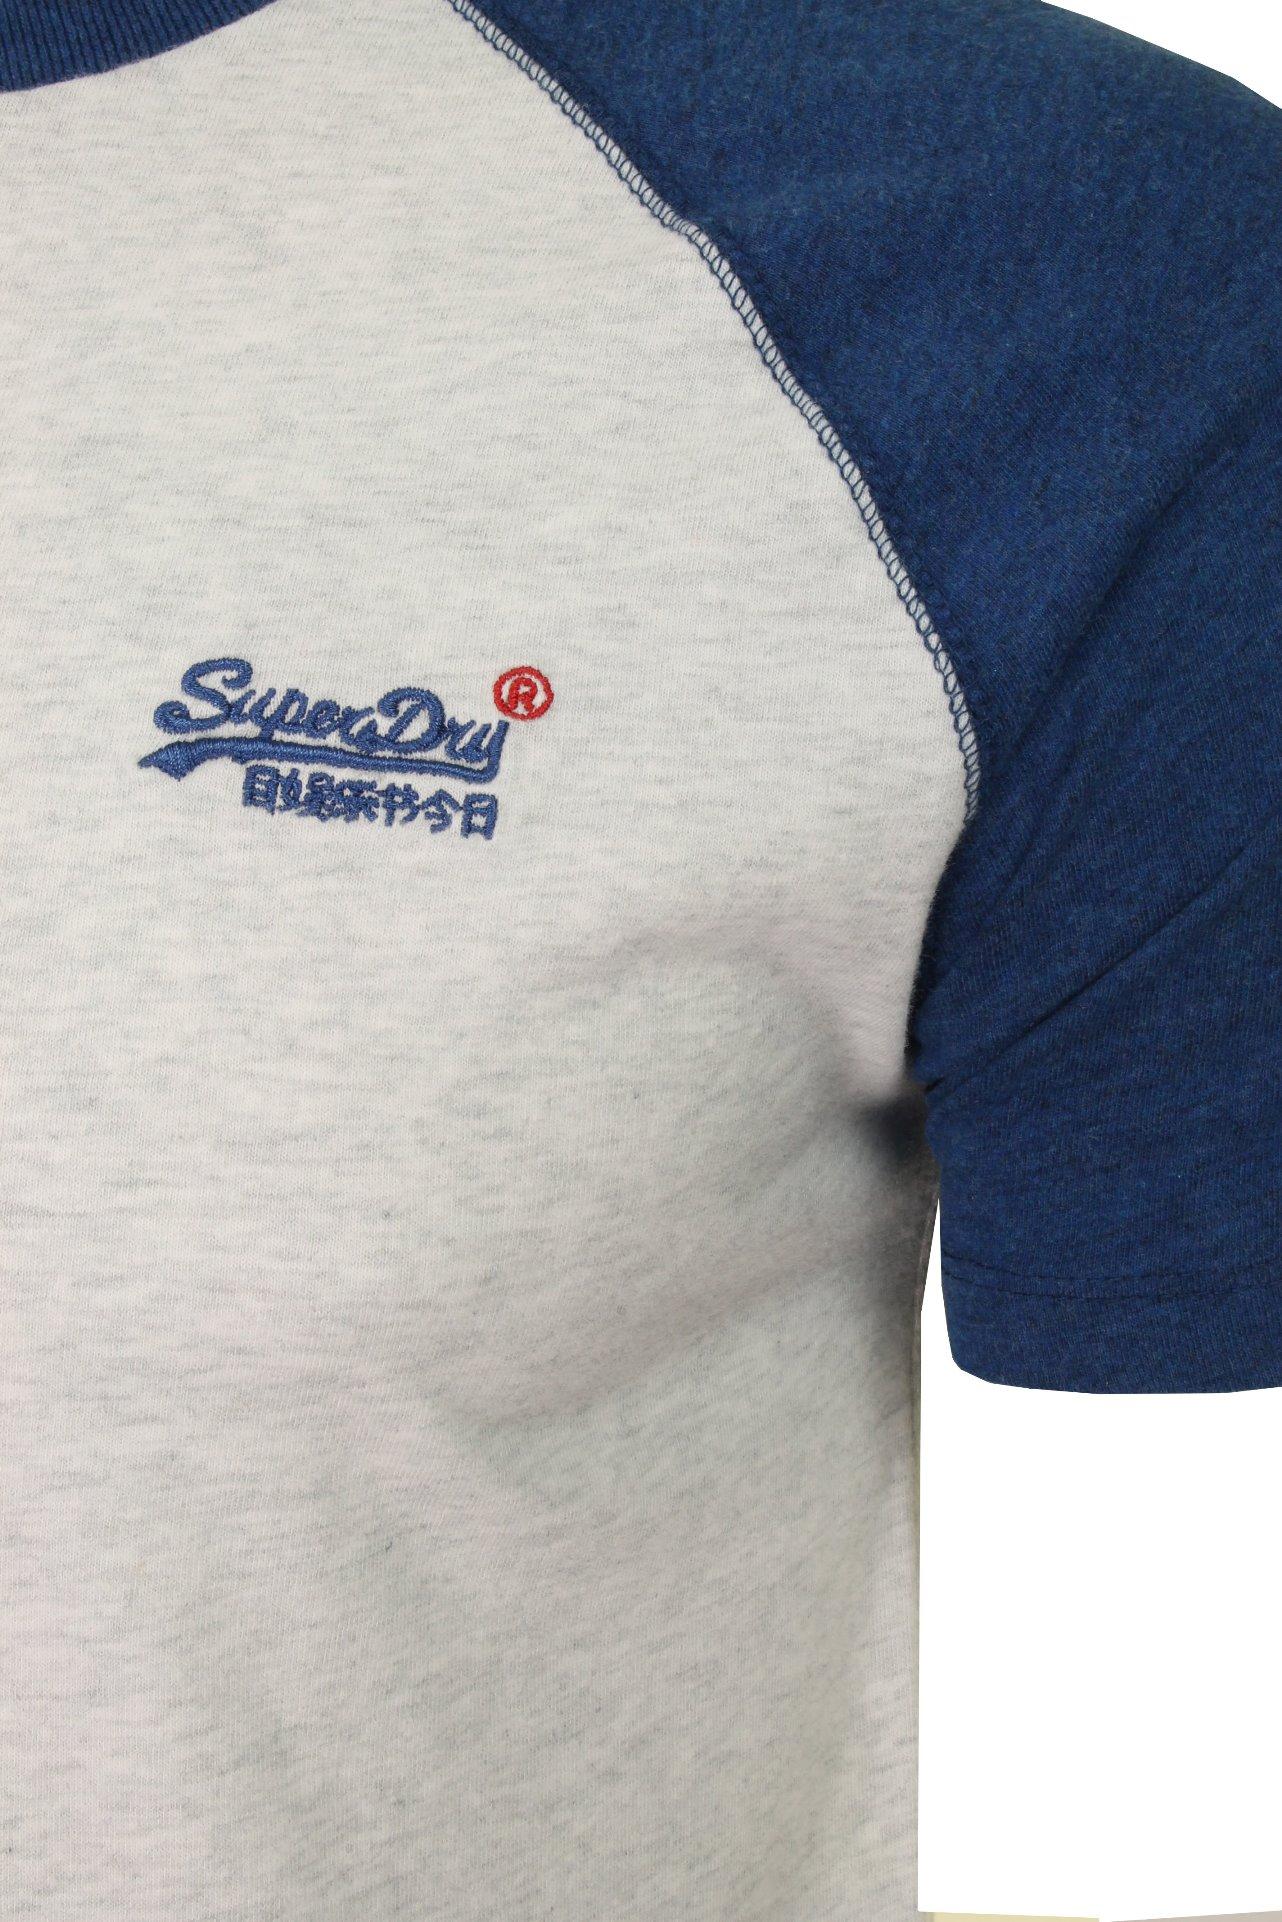 Superdry-Mens-039-Baseball-039-Raglan-Short-Sleeved-T-Shirt thumbnail 4